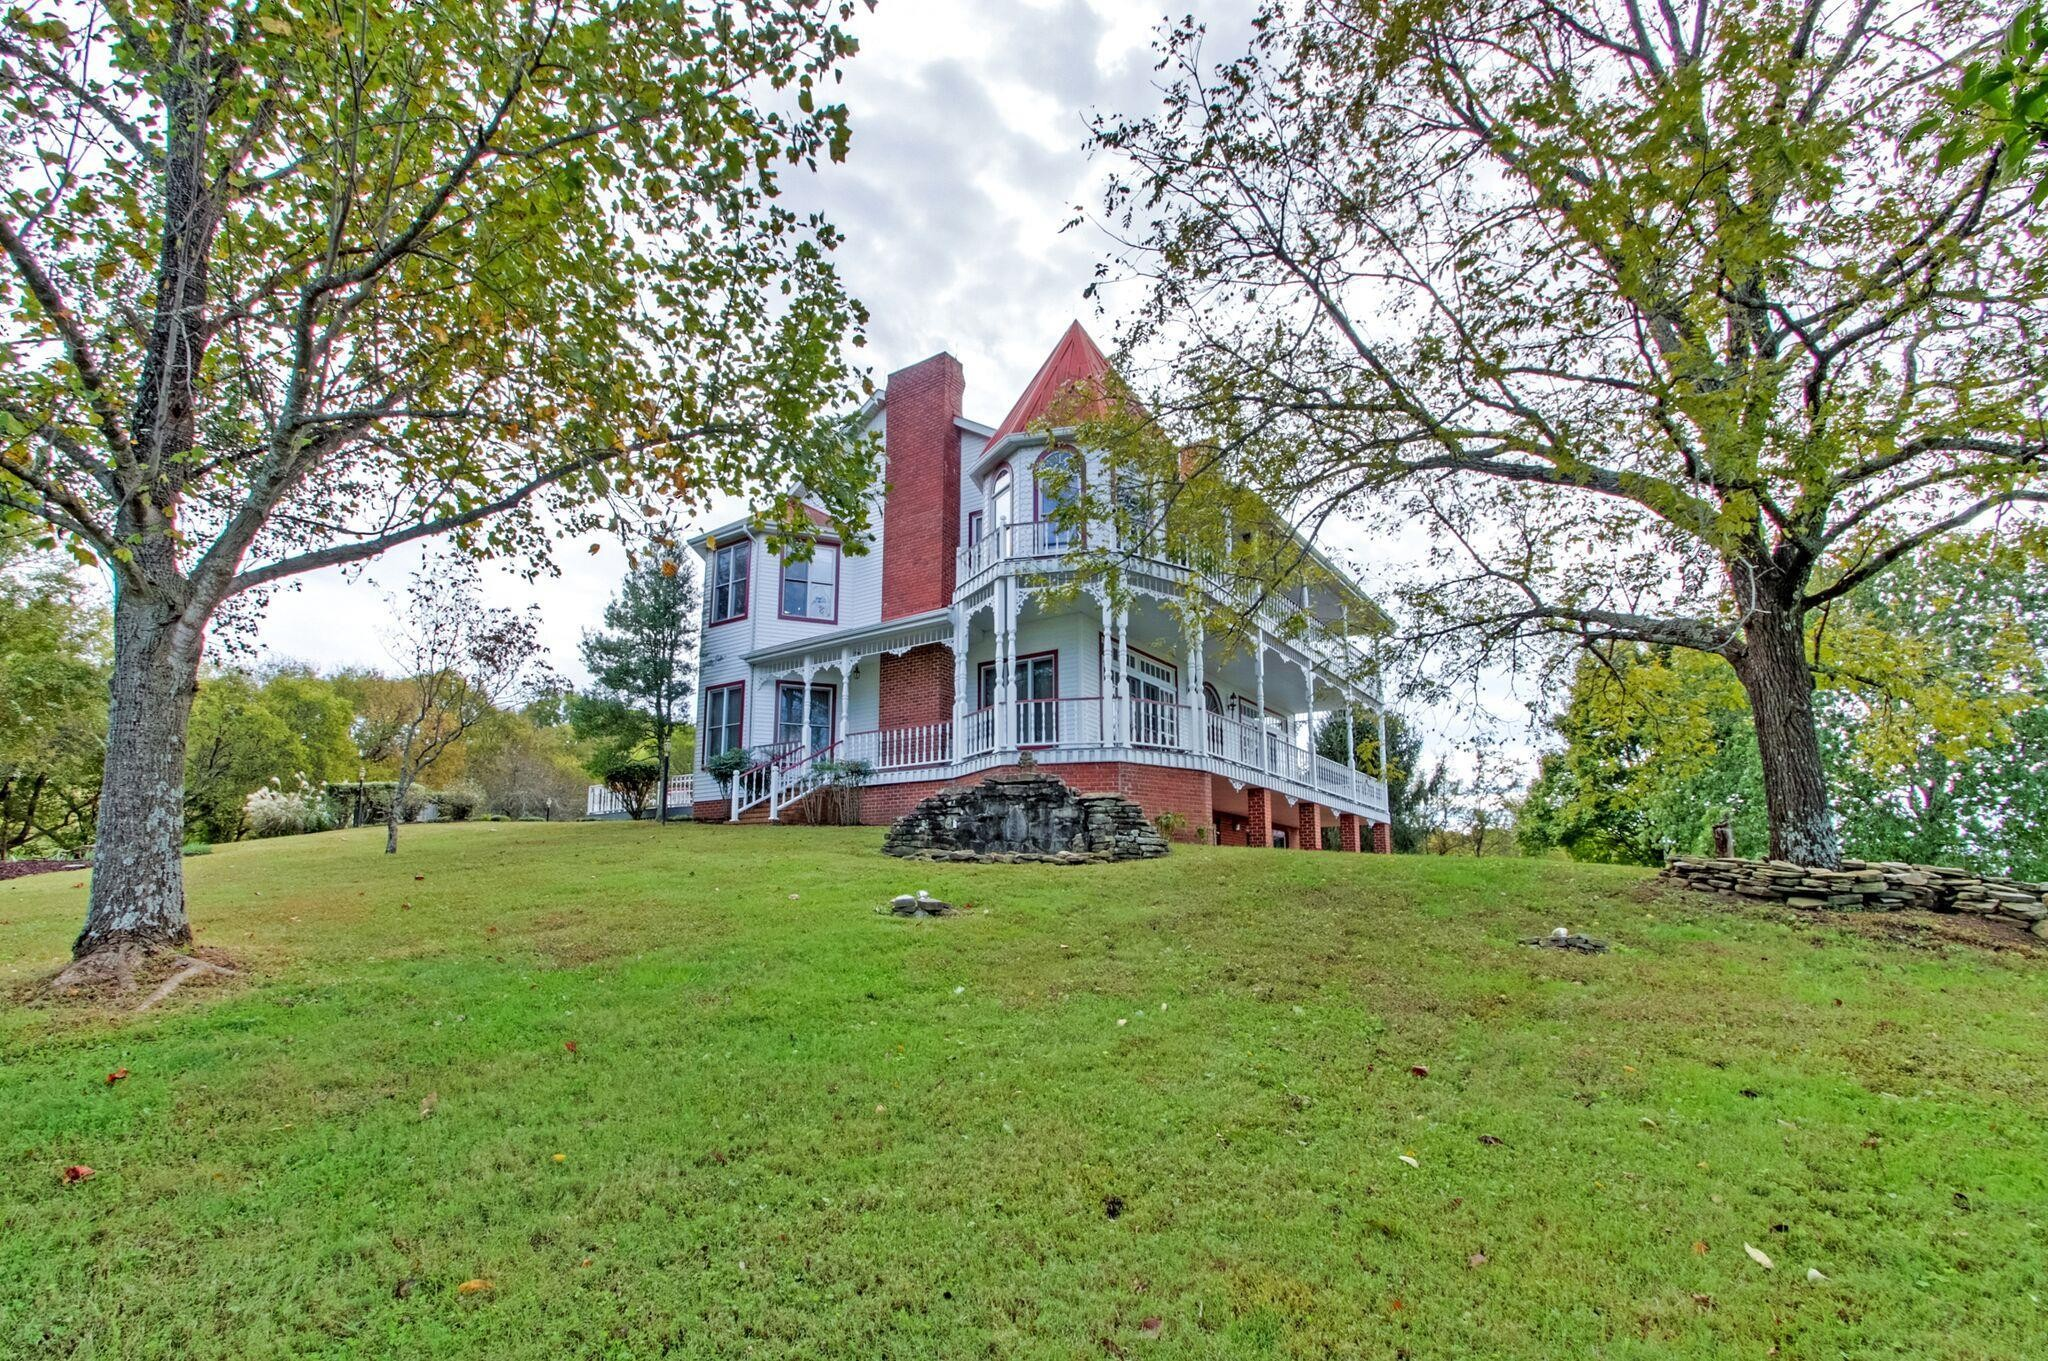 484 Walker Rd, S Property Photo - Wartrace, TN real estate listing